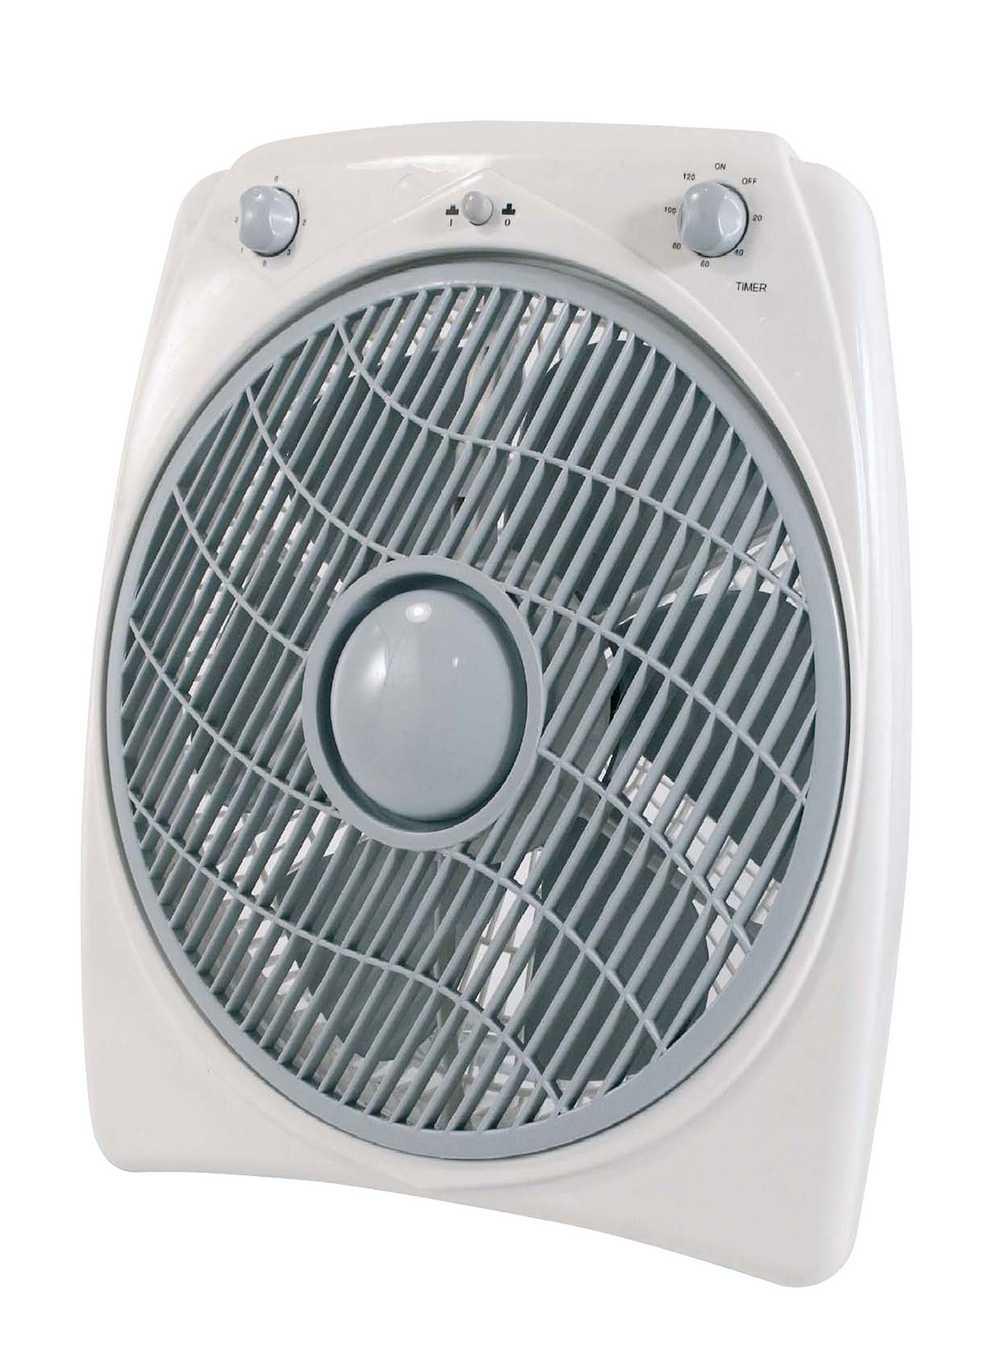 Ventilator Box 30cm 3snel+tim120m W